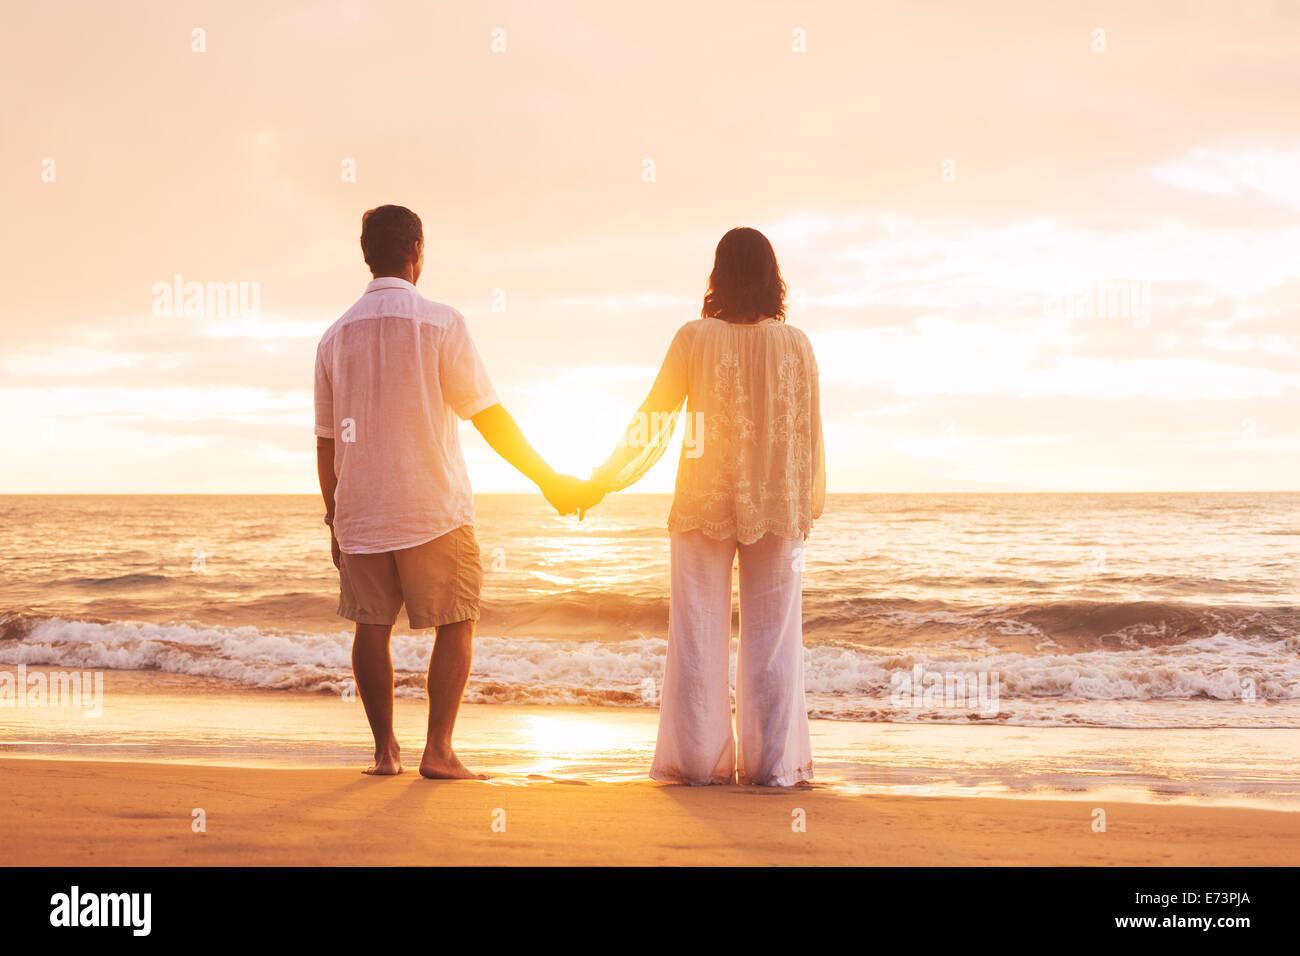 Romantic Mature Couple Enjoying Sunset at the Beach - Stock Image